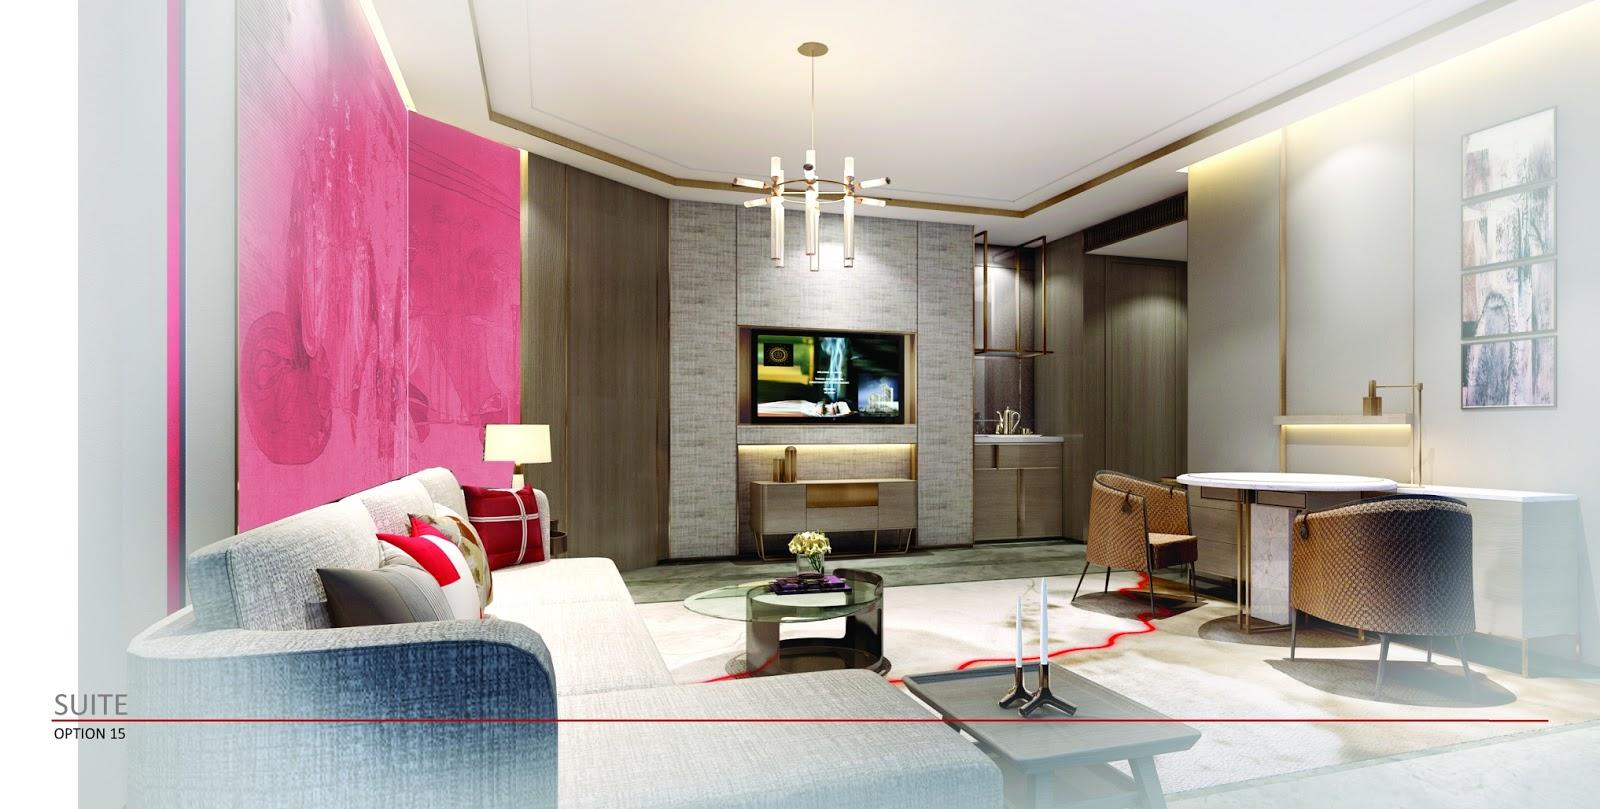 Căn hộ condotel La Luna Resort Nha Trang